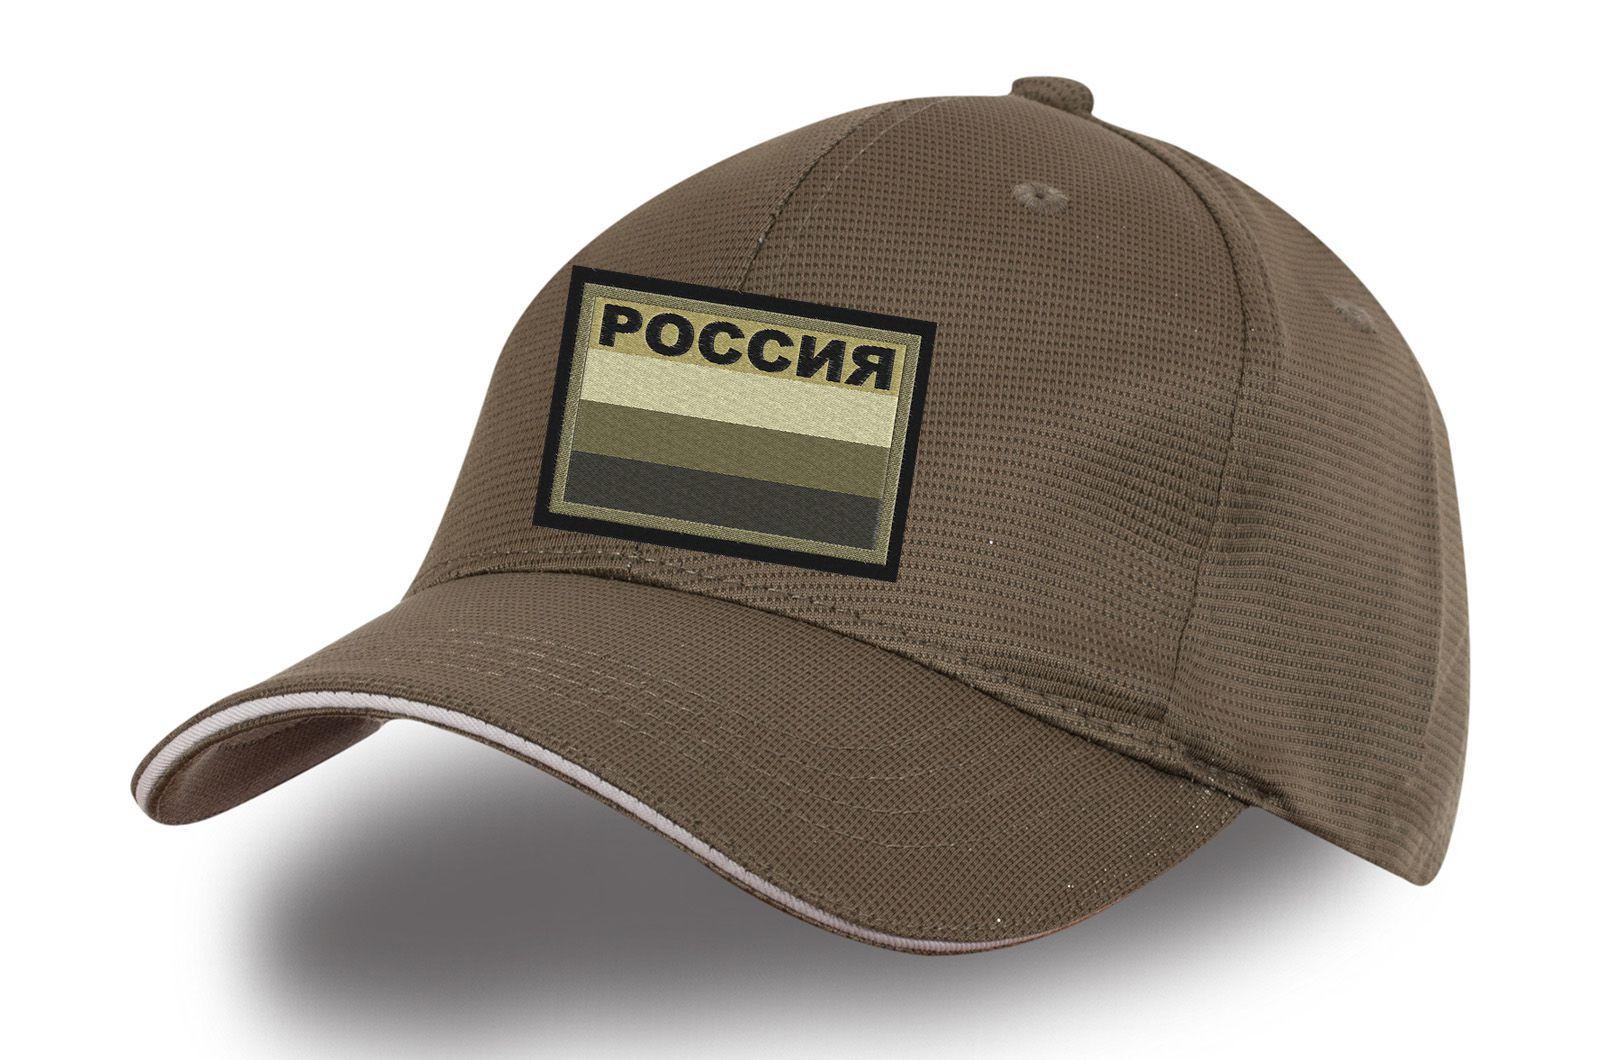 Кепка милитари с нашивкой Россия